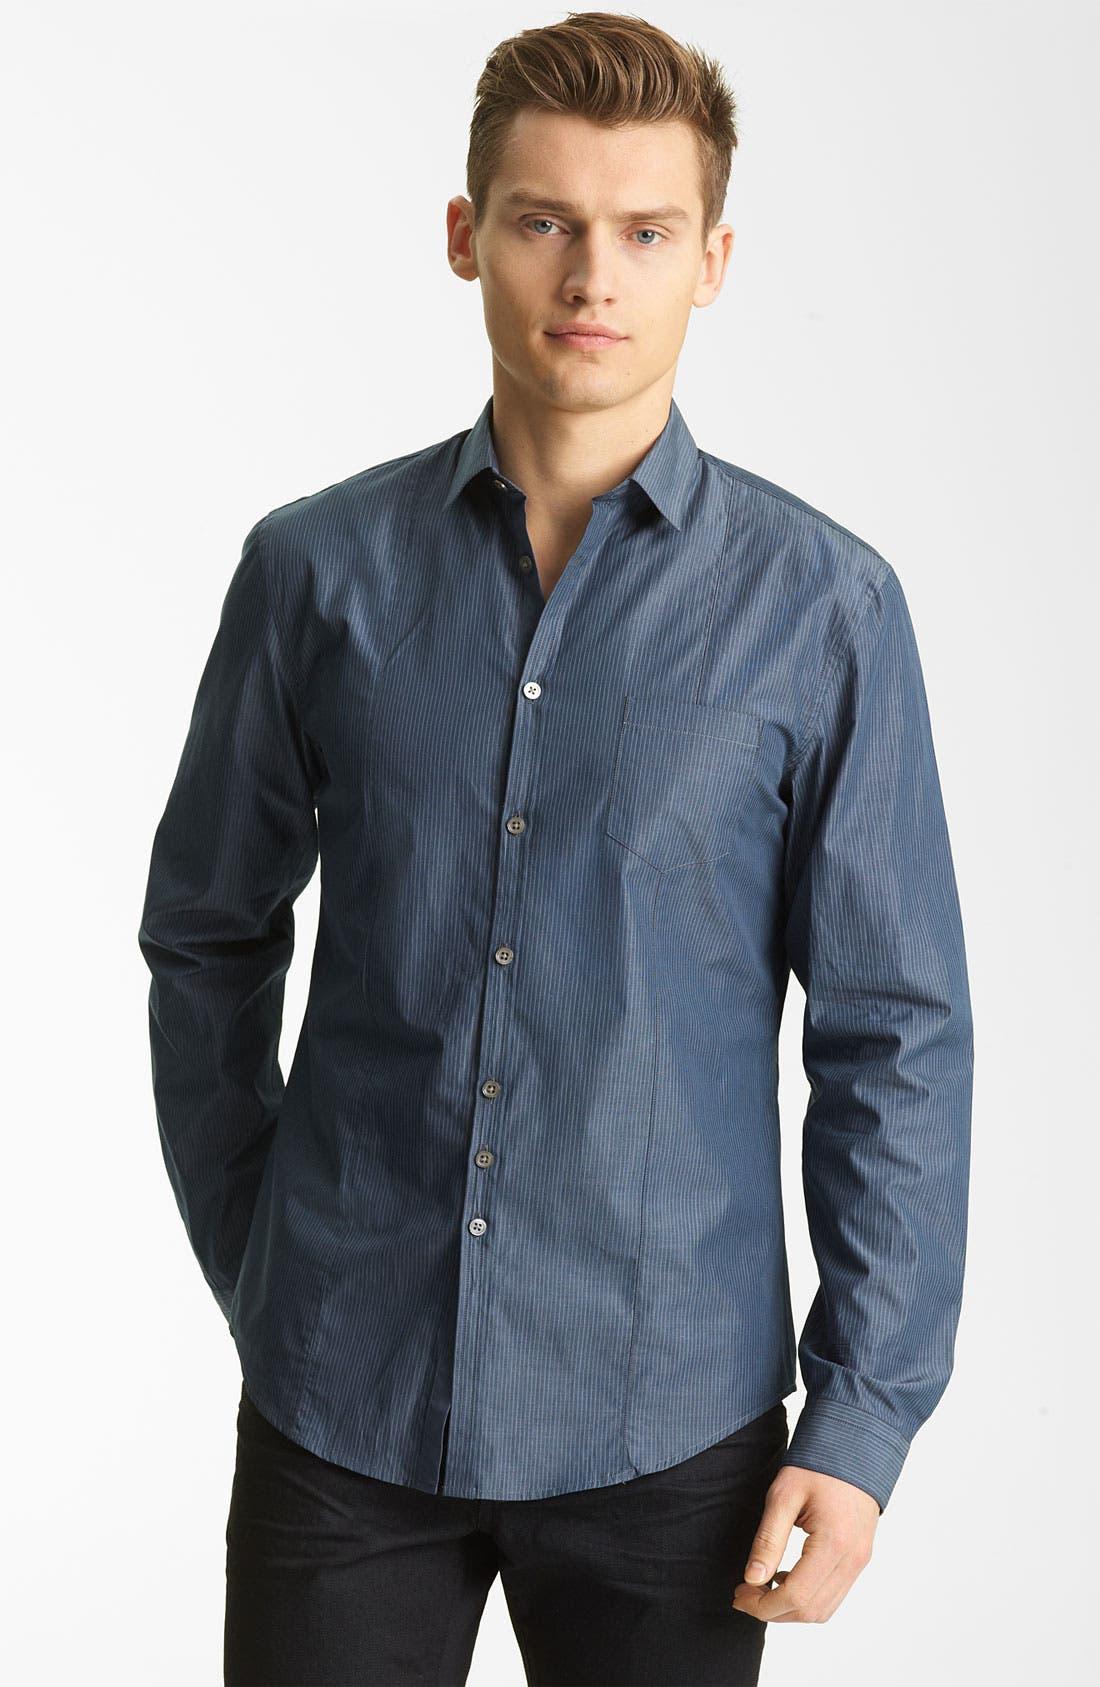 Alternate Image 1 Selected - John Varvatos Collection Stripe Woven Shirt